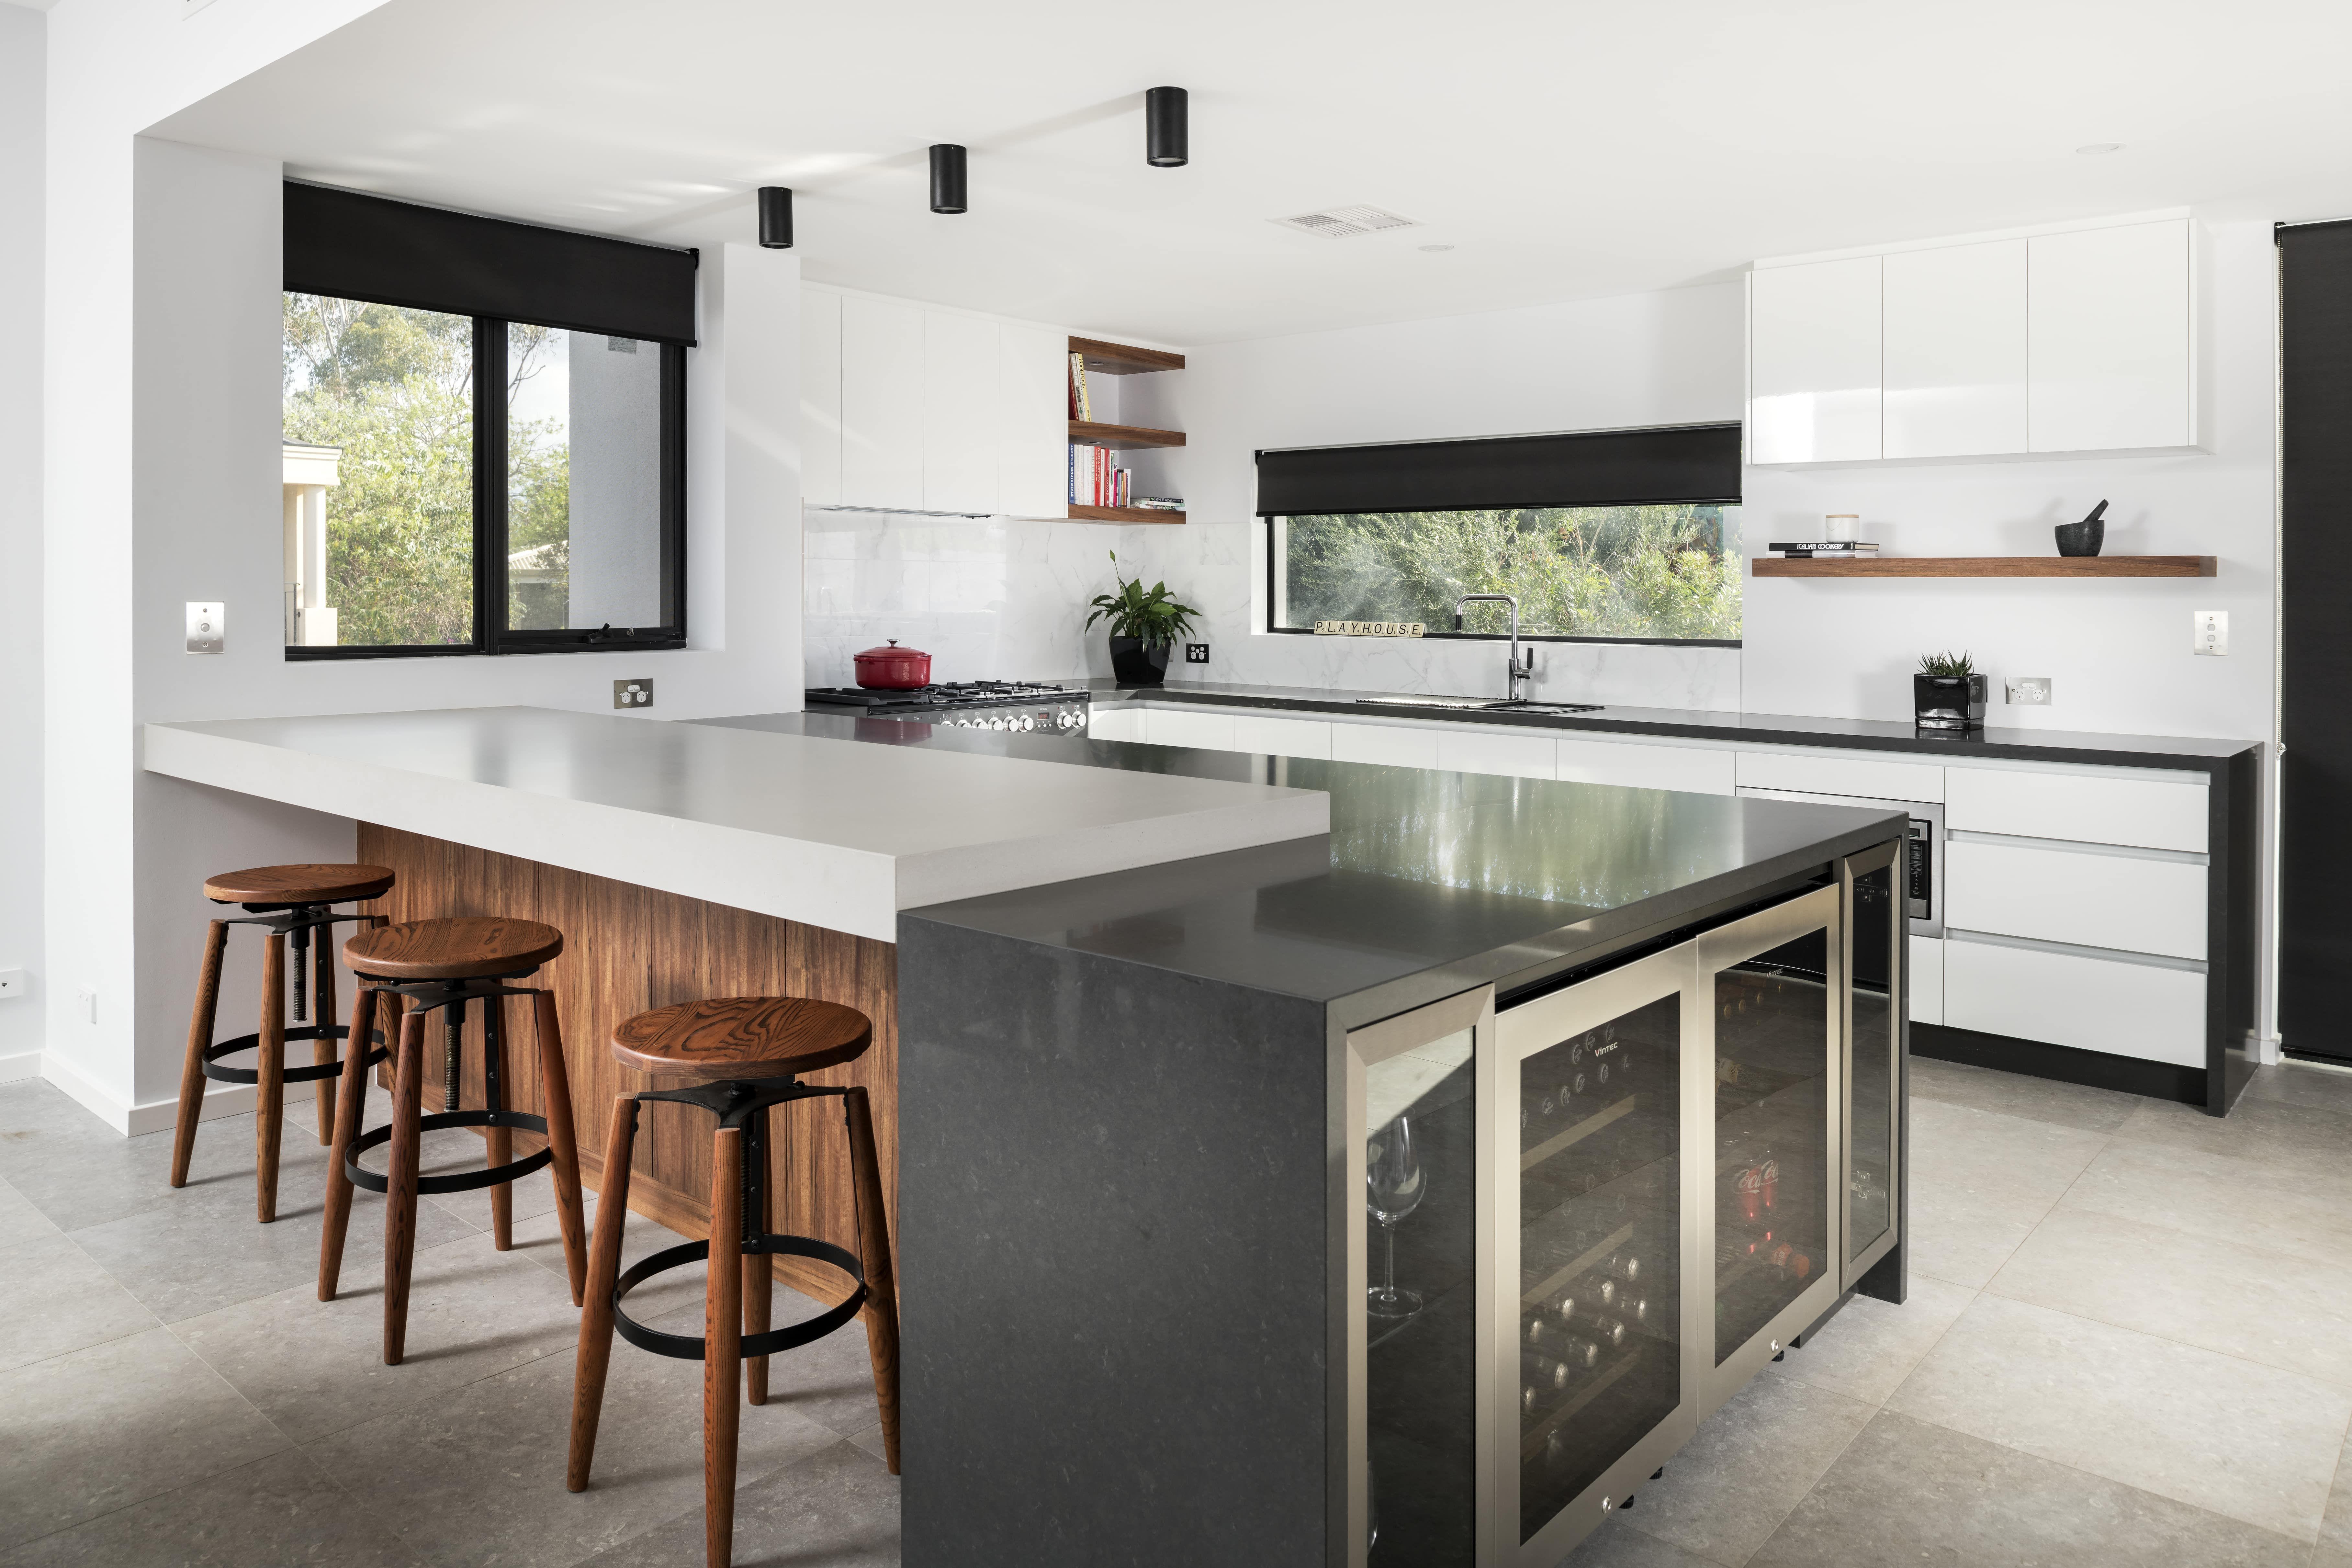 3d modular kitchen design software free download  free